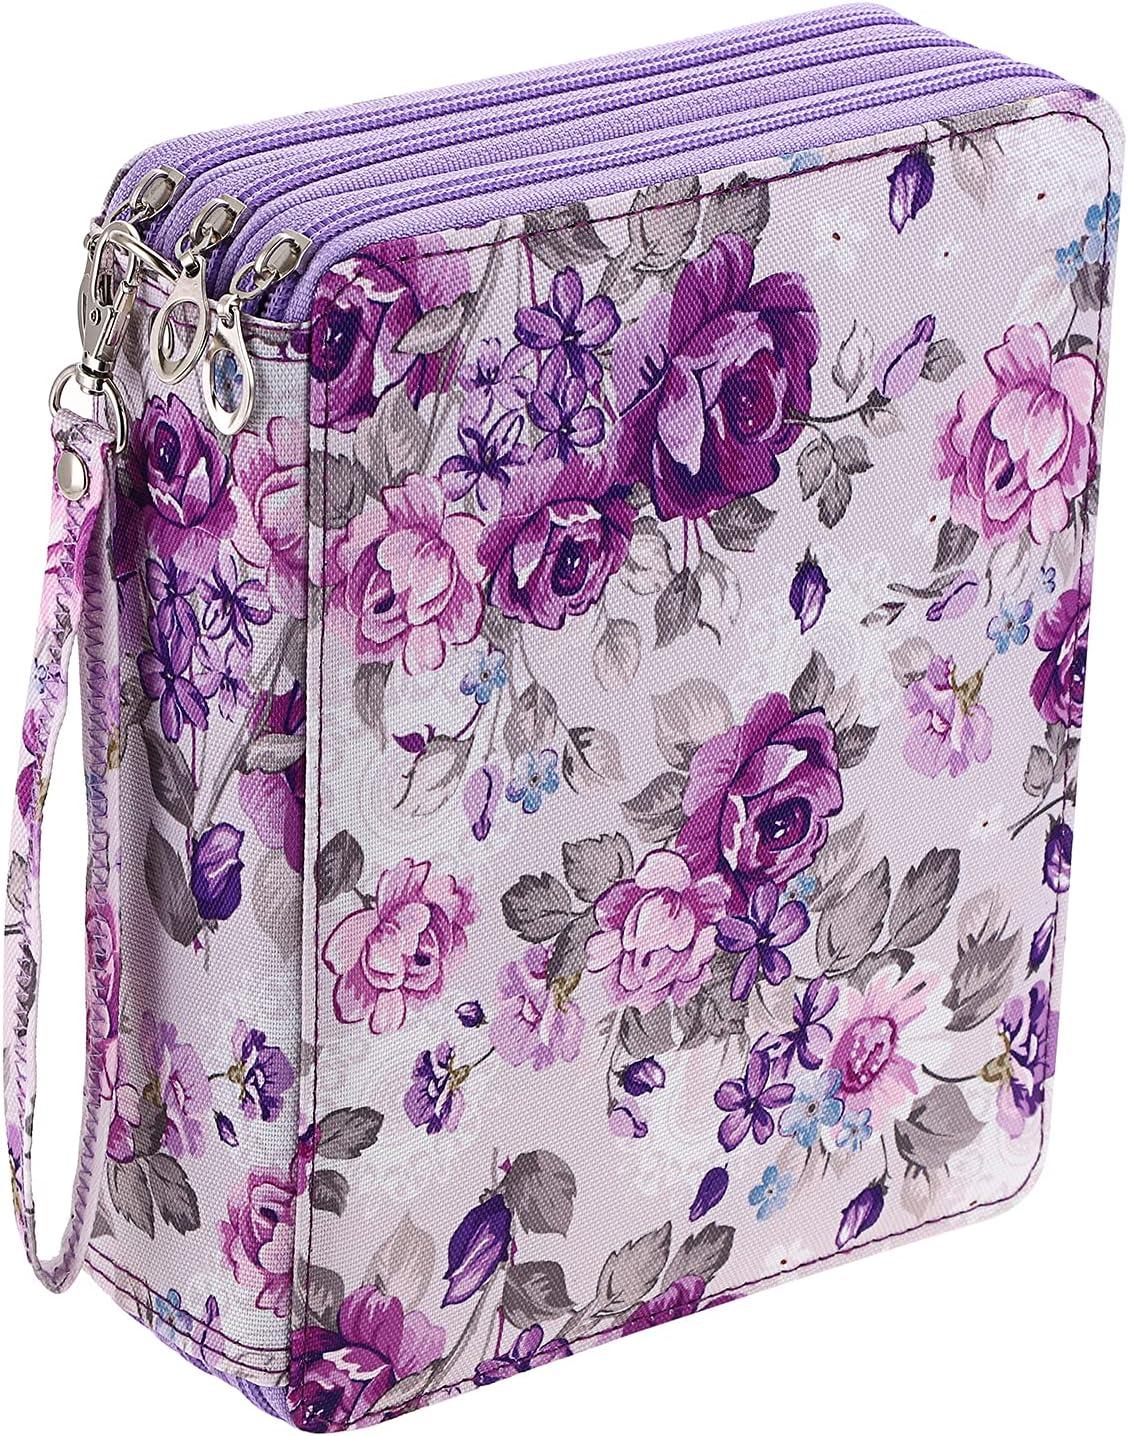 BTSKY Colored Pencil Case- 120 Slots Pen Bag Large San Antonio Mall Holder Be super welcome